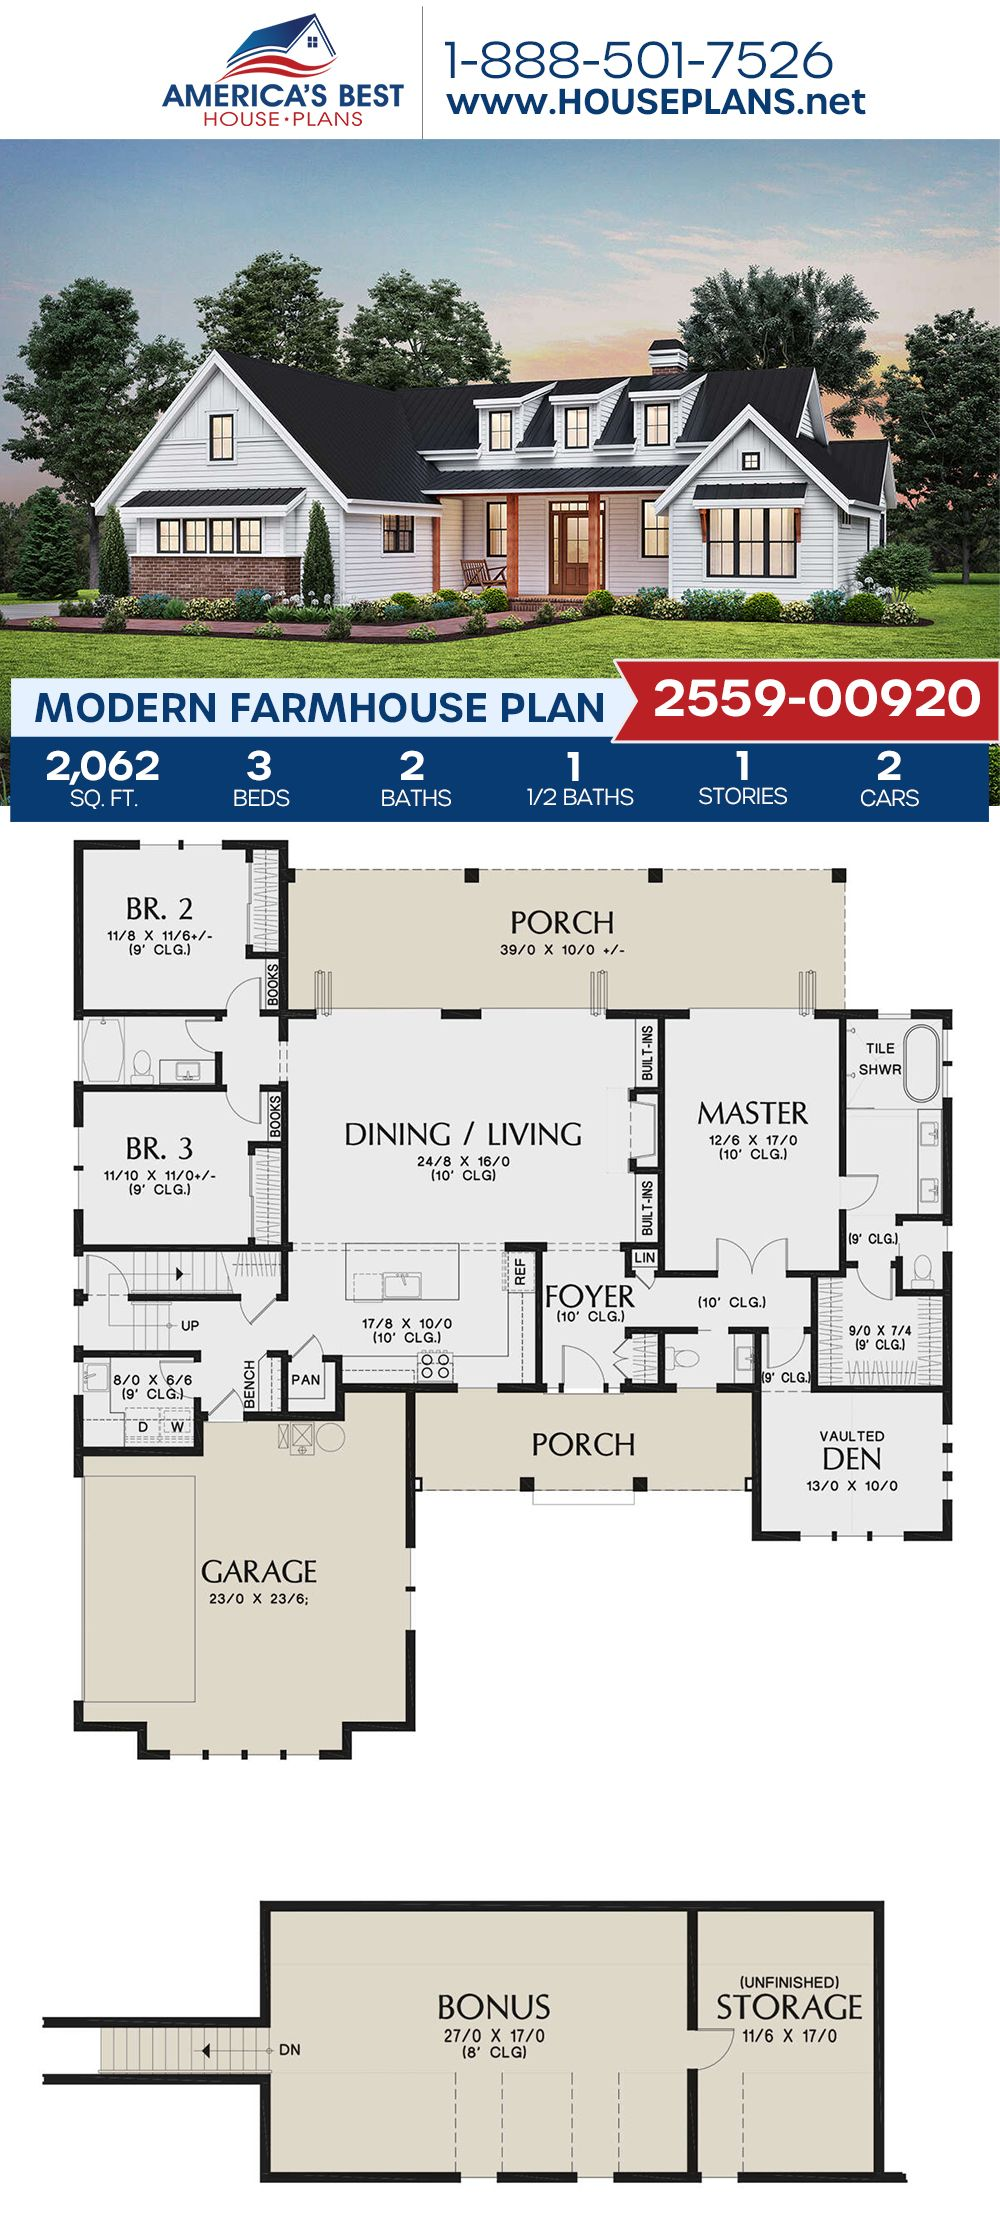 House Plan 2559 00920 Modern Farmhouse Plan 2 062 Square Feet 3 Bedrooms 2 5 Bathrooms Modern Farmhouse Plans Farmhouse Plans House Plans